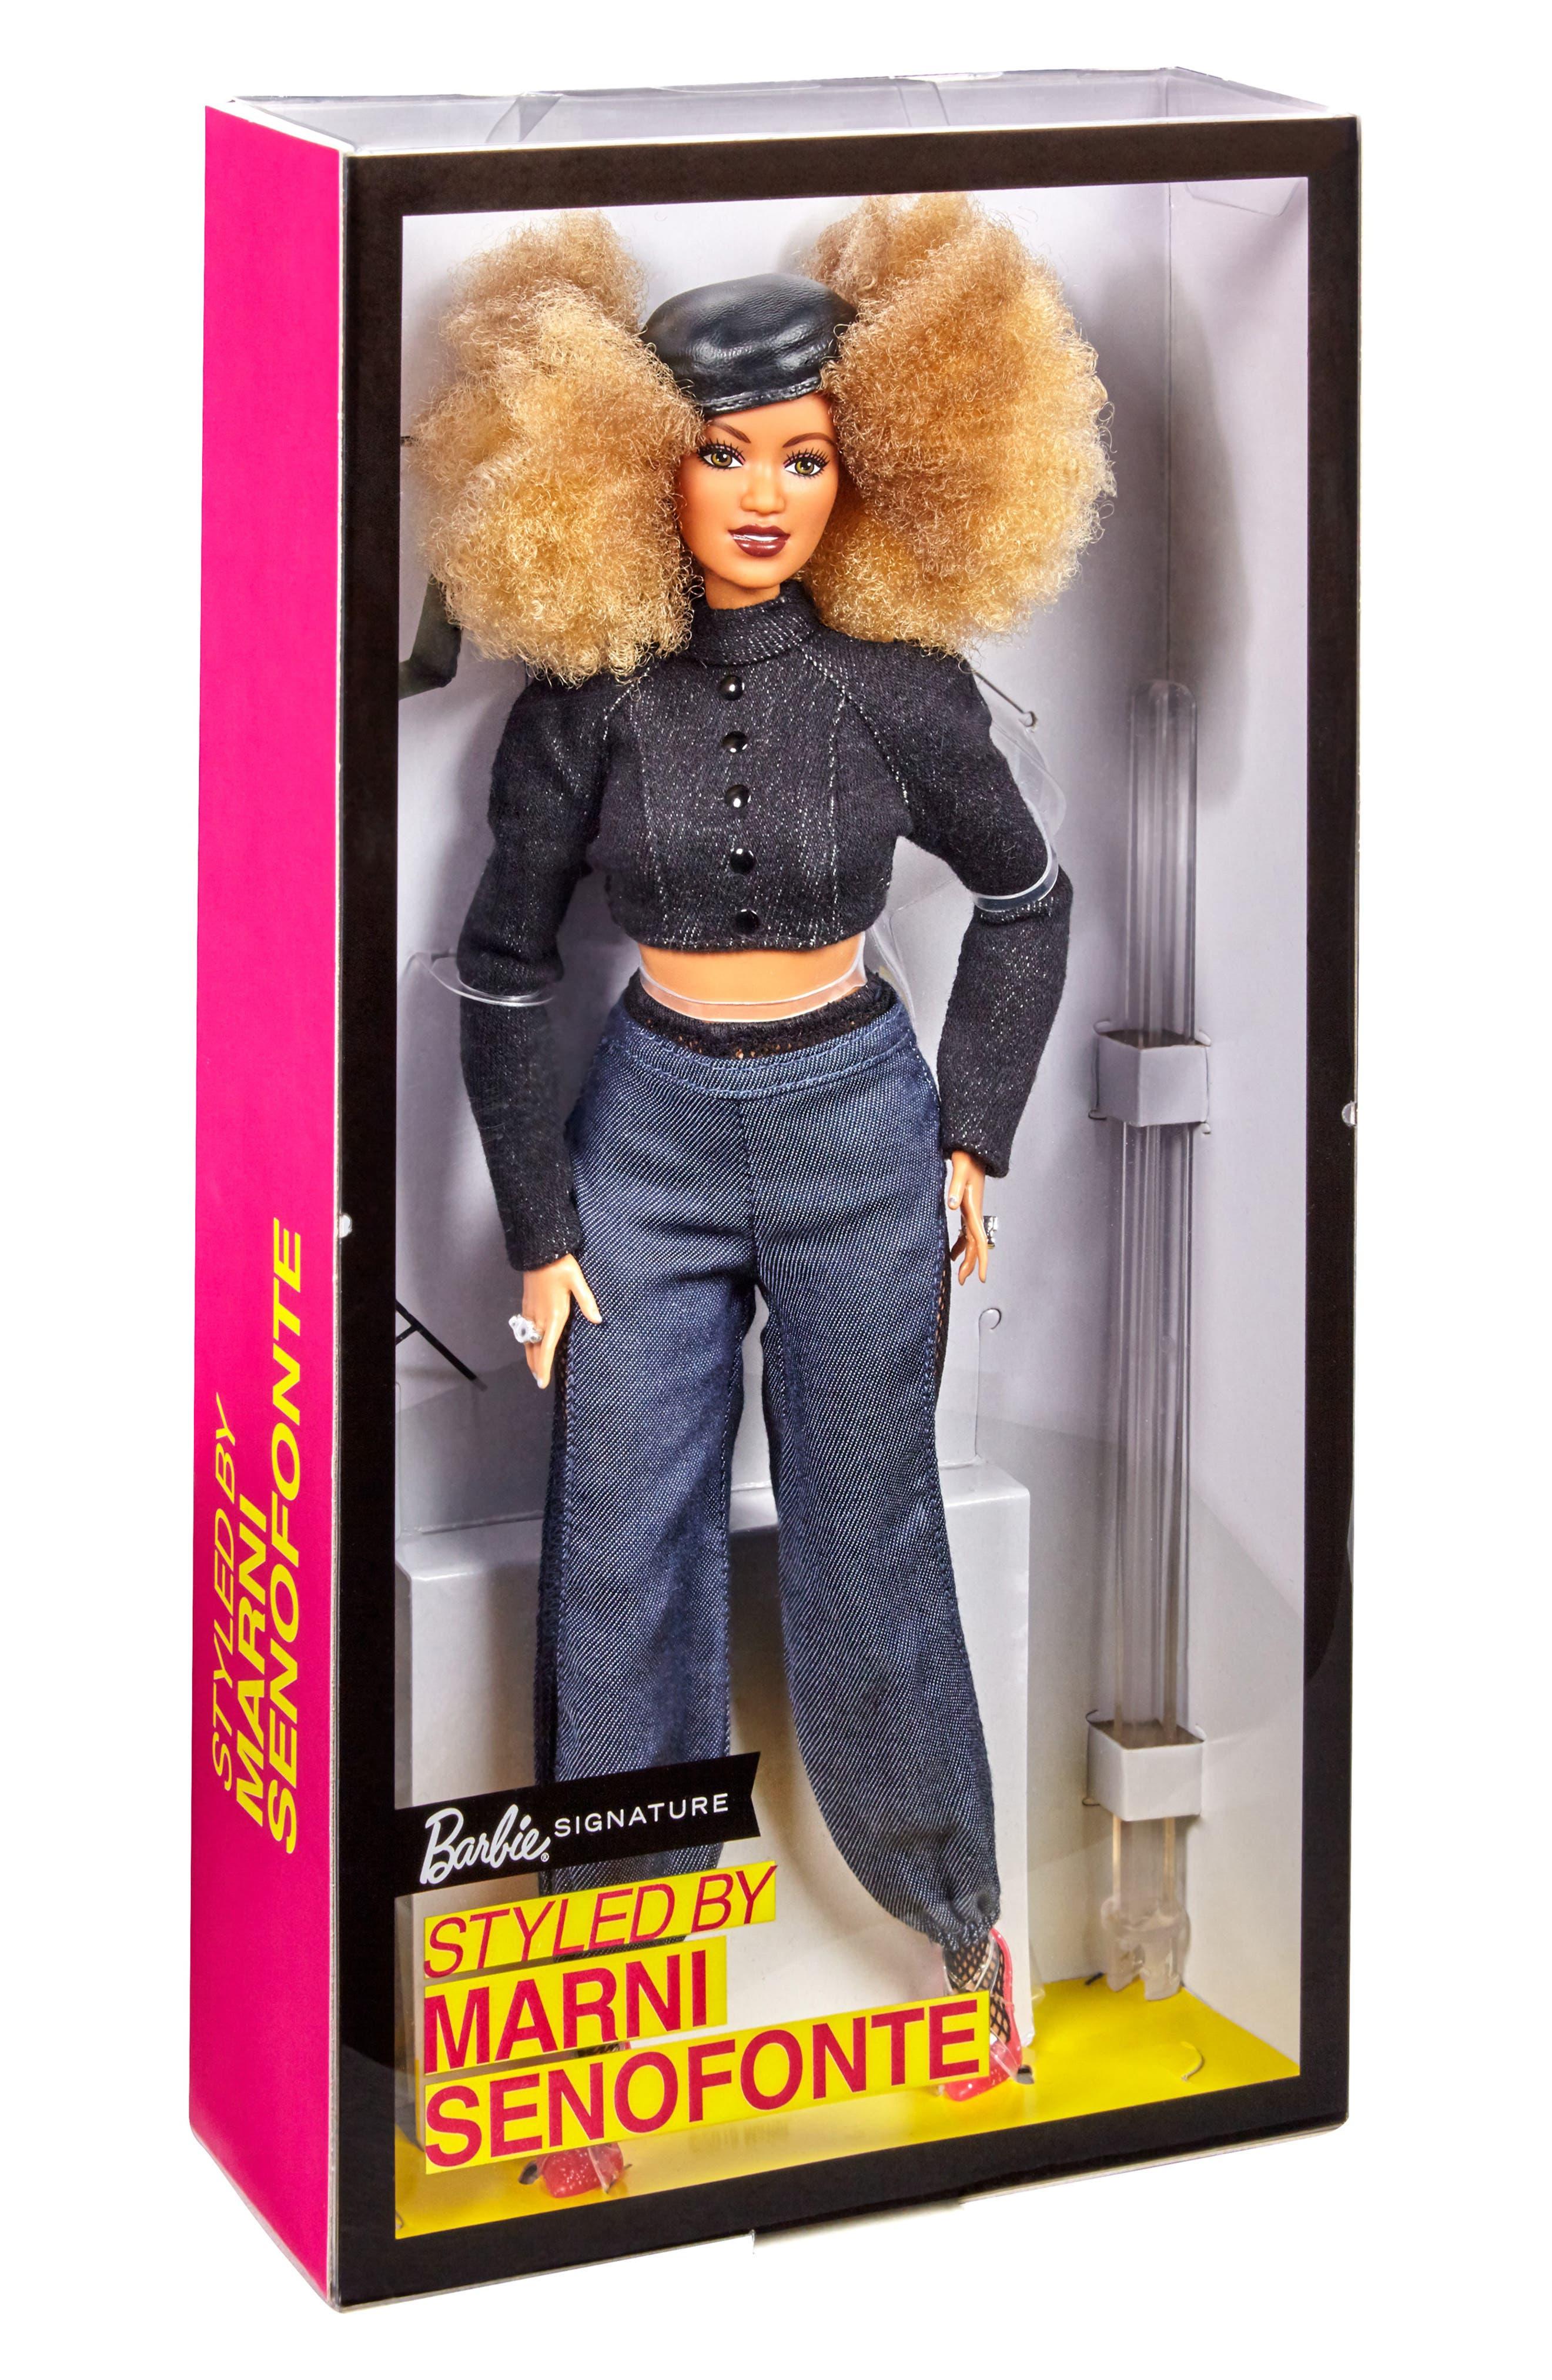 Girls Mattel Barbie Styled By Marni Senofonte Doll